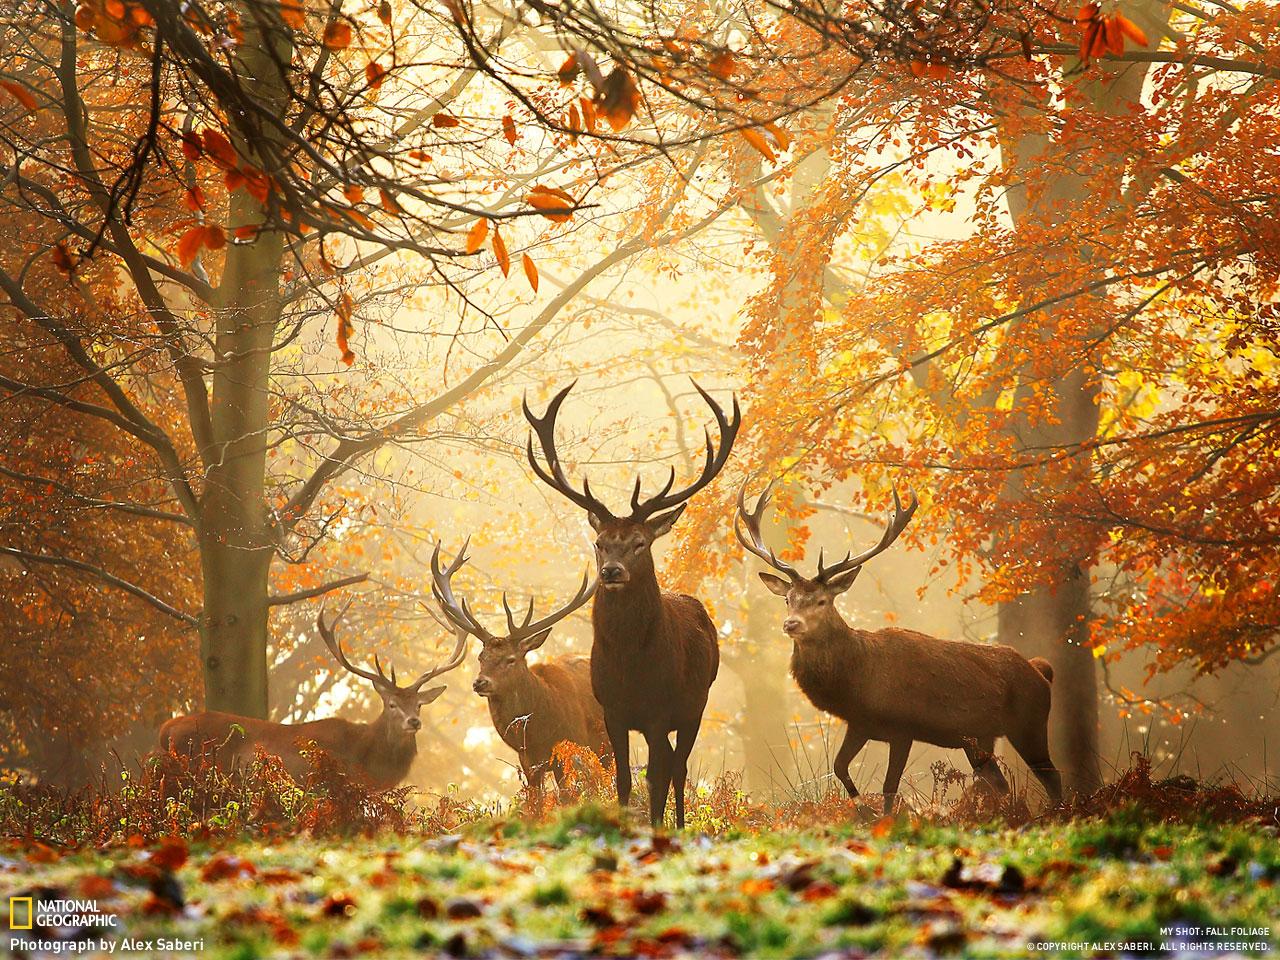 http://2.bp.blogspot.com/-9X2iwzbr5tE/TgYD4PW40QI/AAAAAAAAAUE/qwl6MMlPdwo/s1600/fall1.jpg